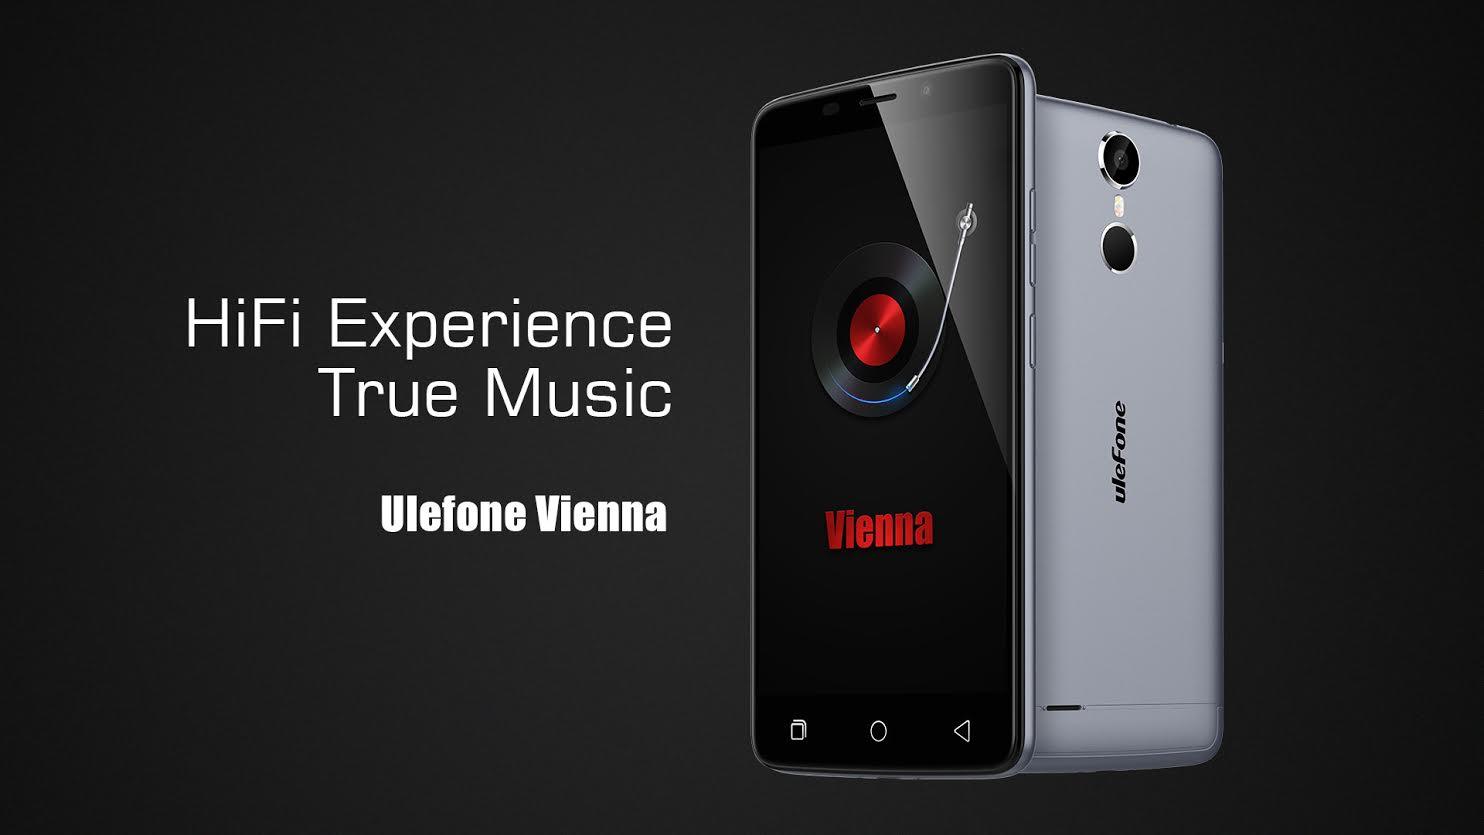 Ulefone Vienna, un asalto curioso a la gama media con sonido HiFi